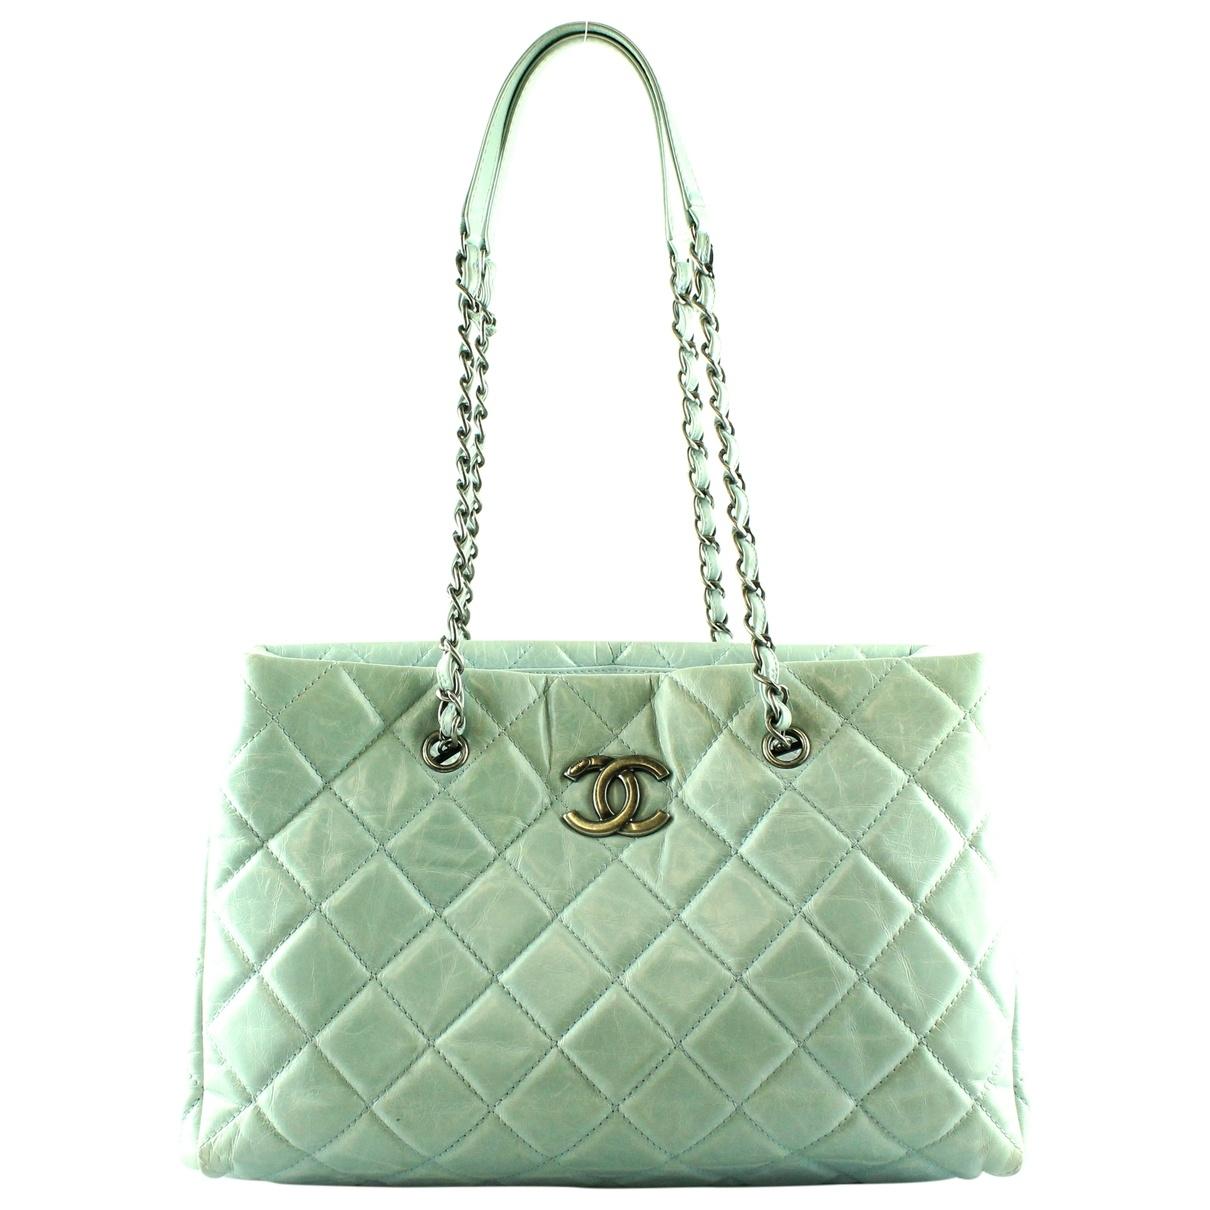 Chanel \N Green Leather handbag for Women \N